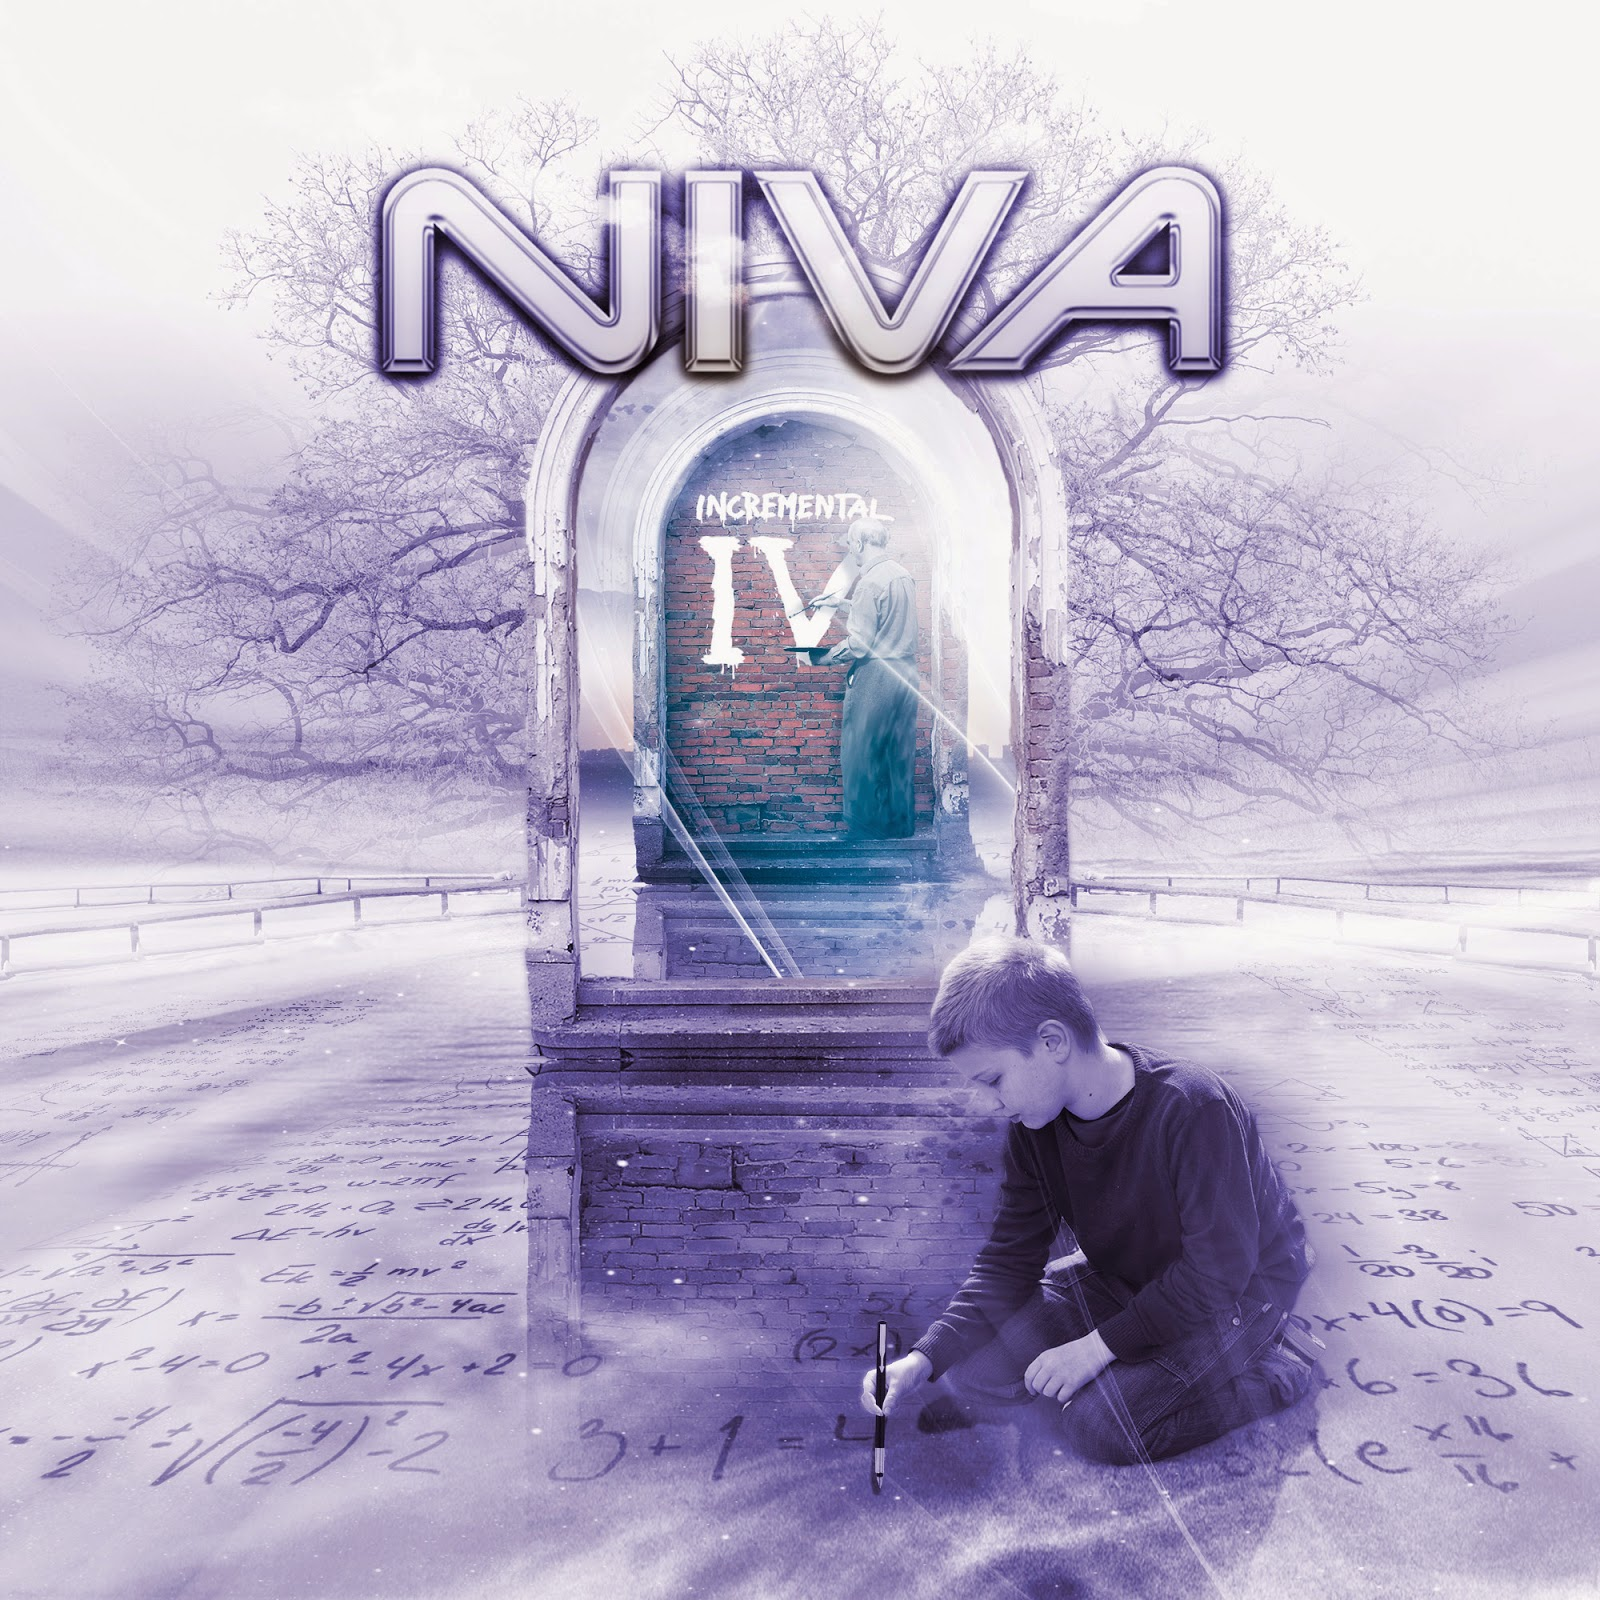 http://rock-and-metal-4-you.blogspot.de/2014/07/cd-review-niva-incremental-iv.html